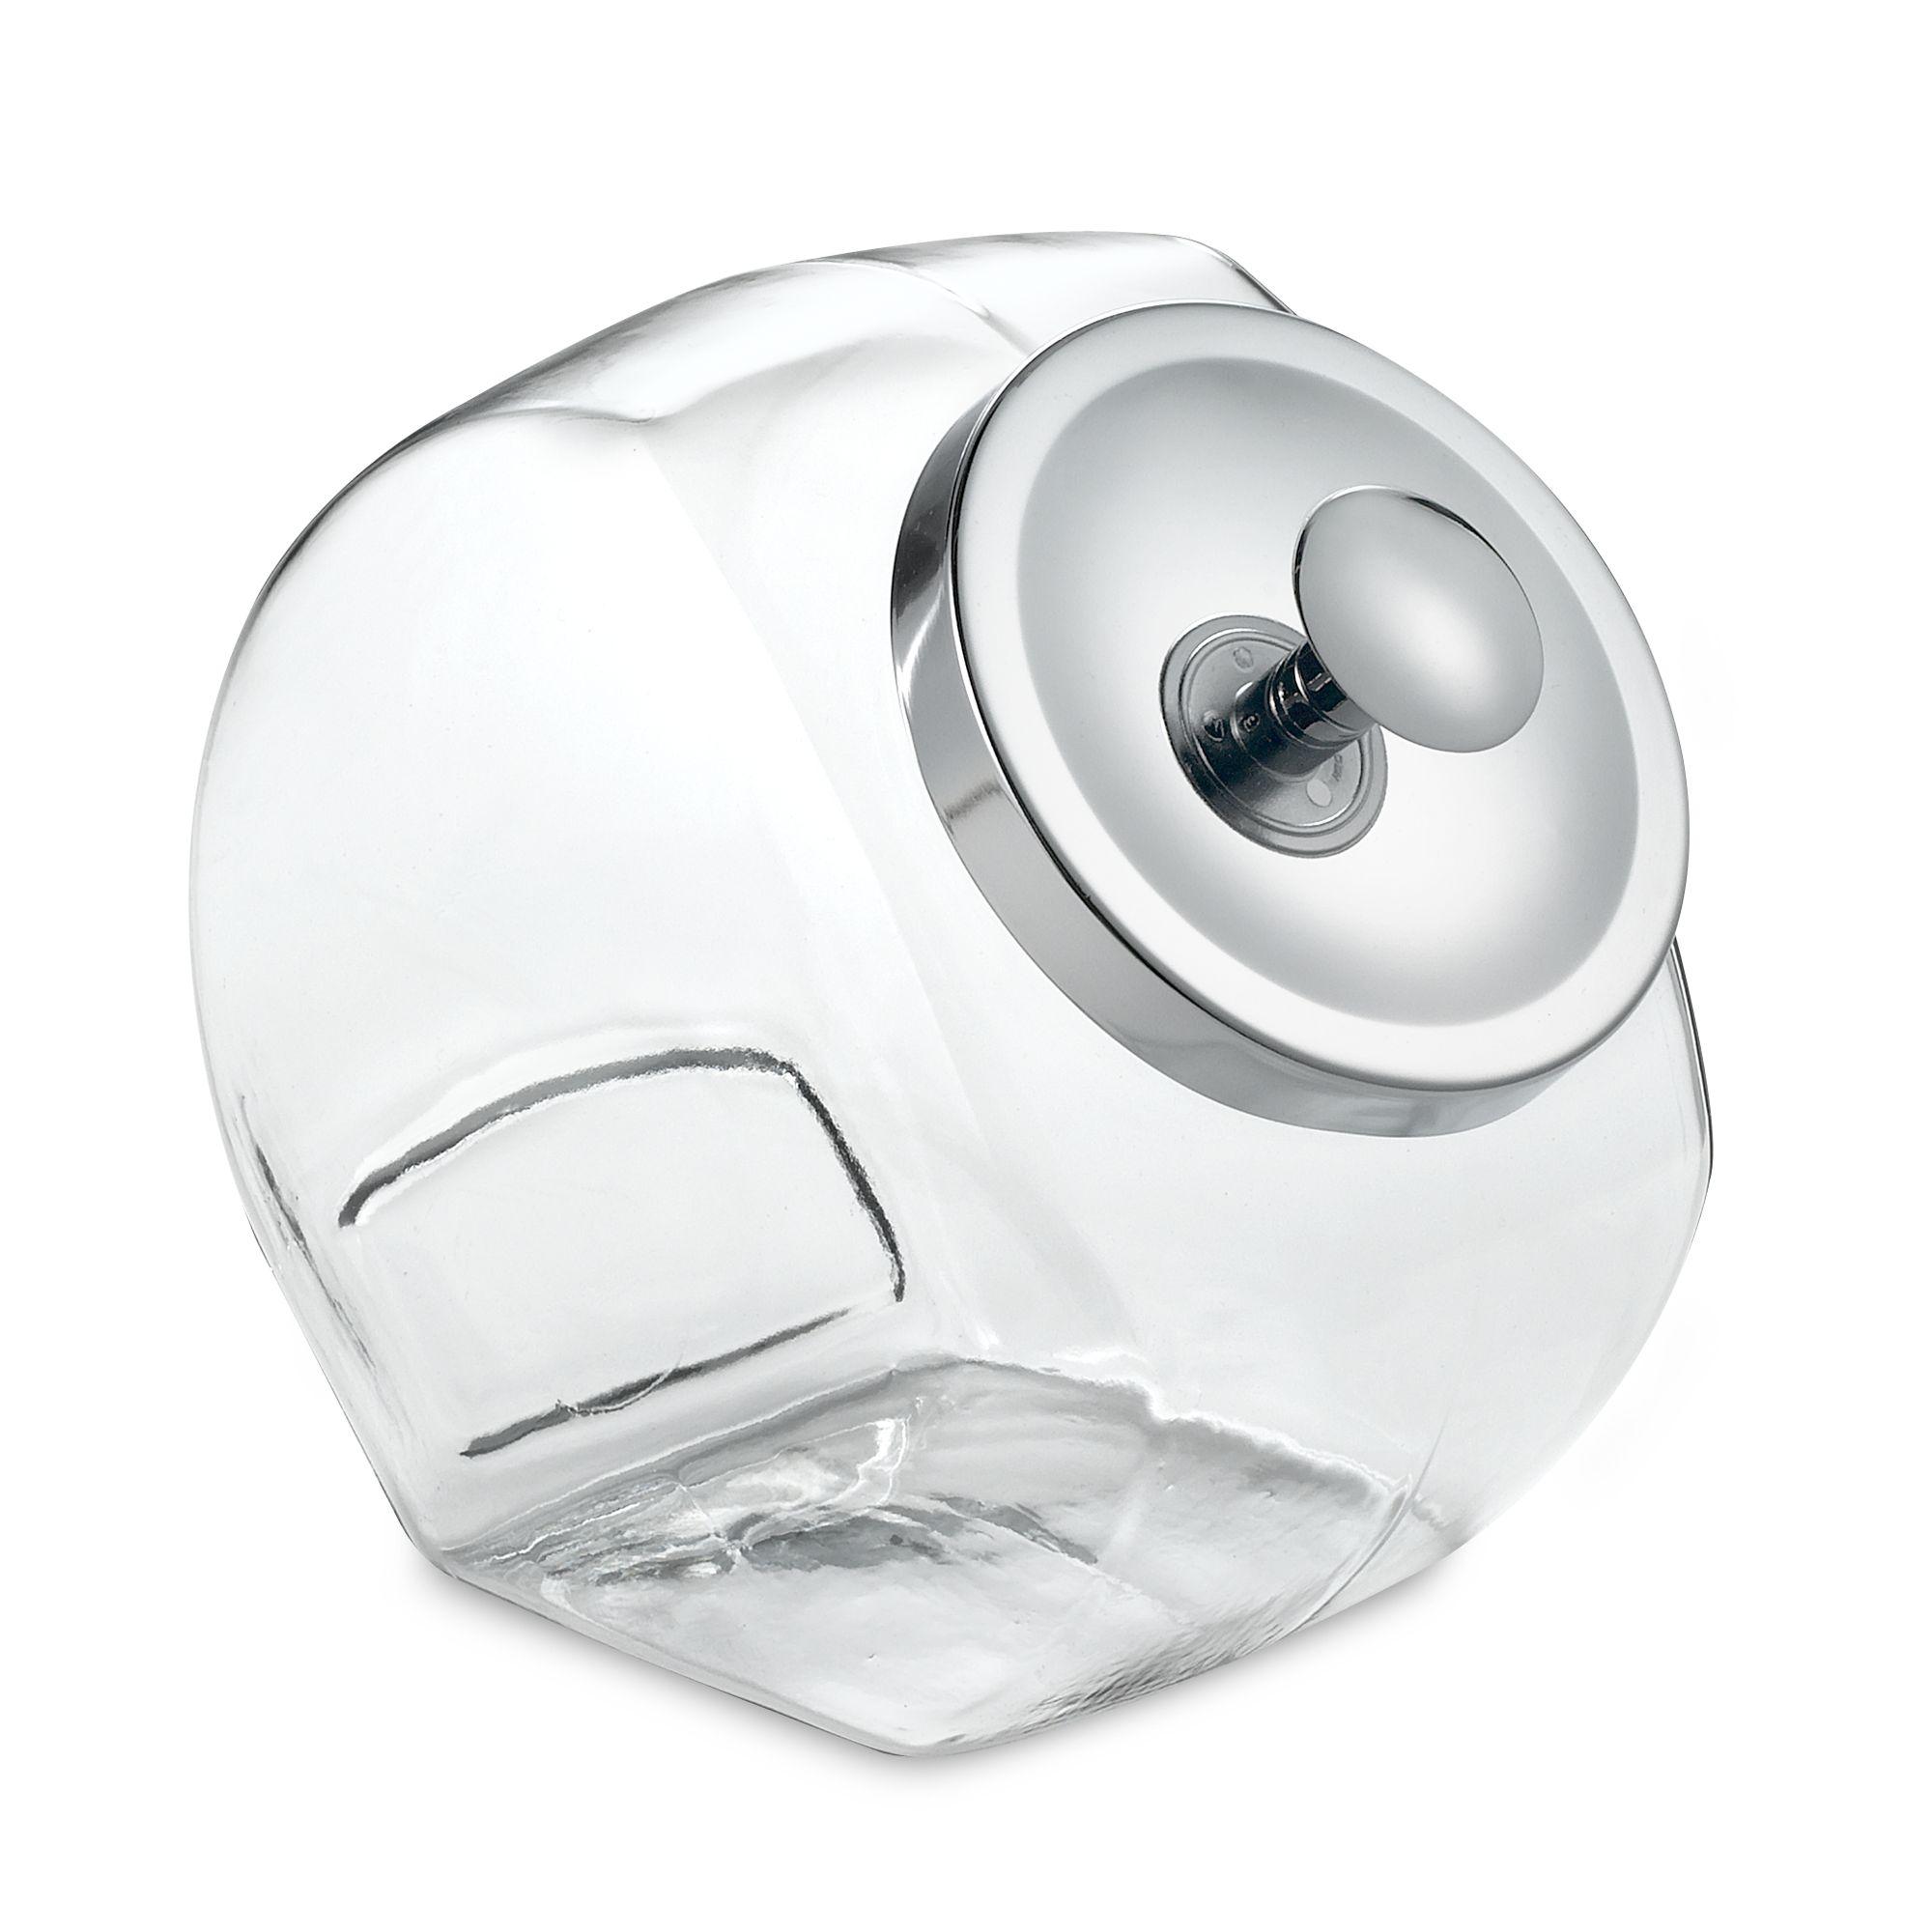 Anchor Hocking Glass Jars Anchor Hocking® 1-gallon Glass